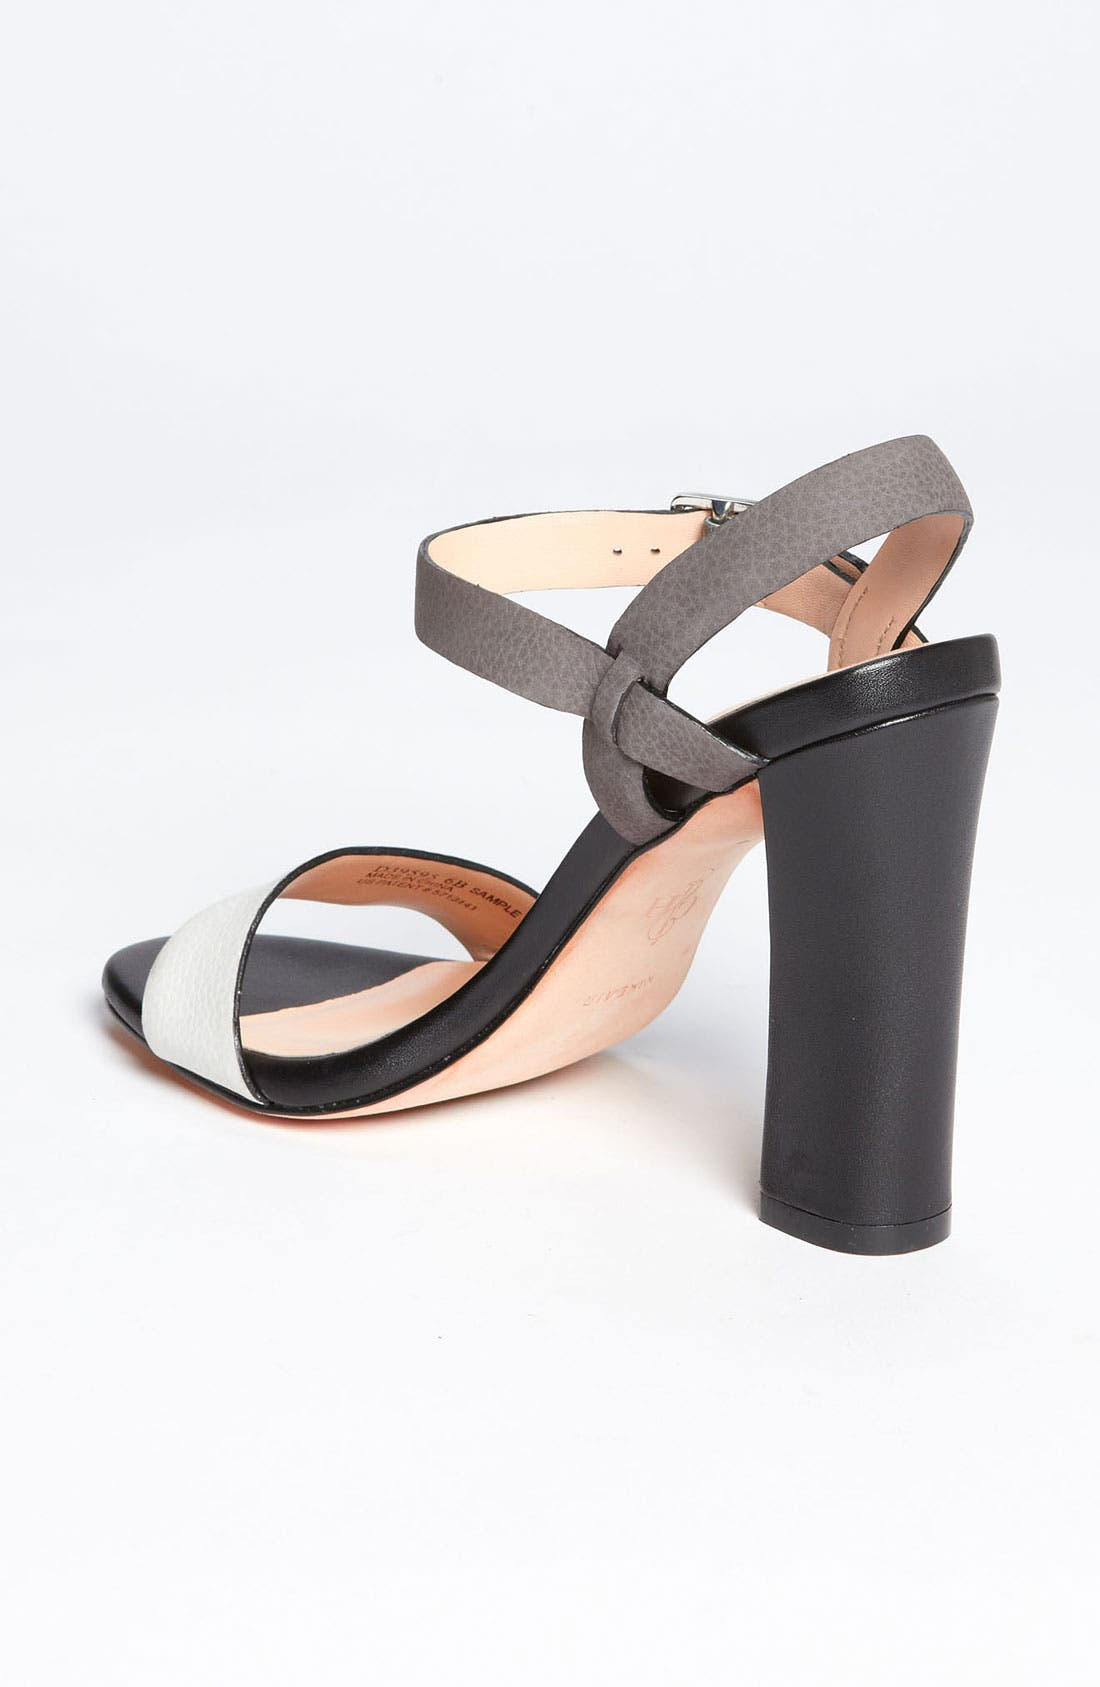 COLE HAAN,                             'Minetta' Sandal,                             Alternate thumbnail 4, color,                             020